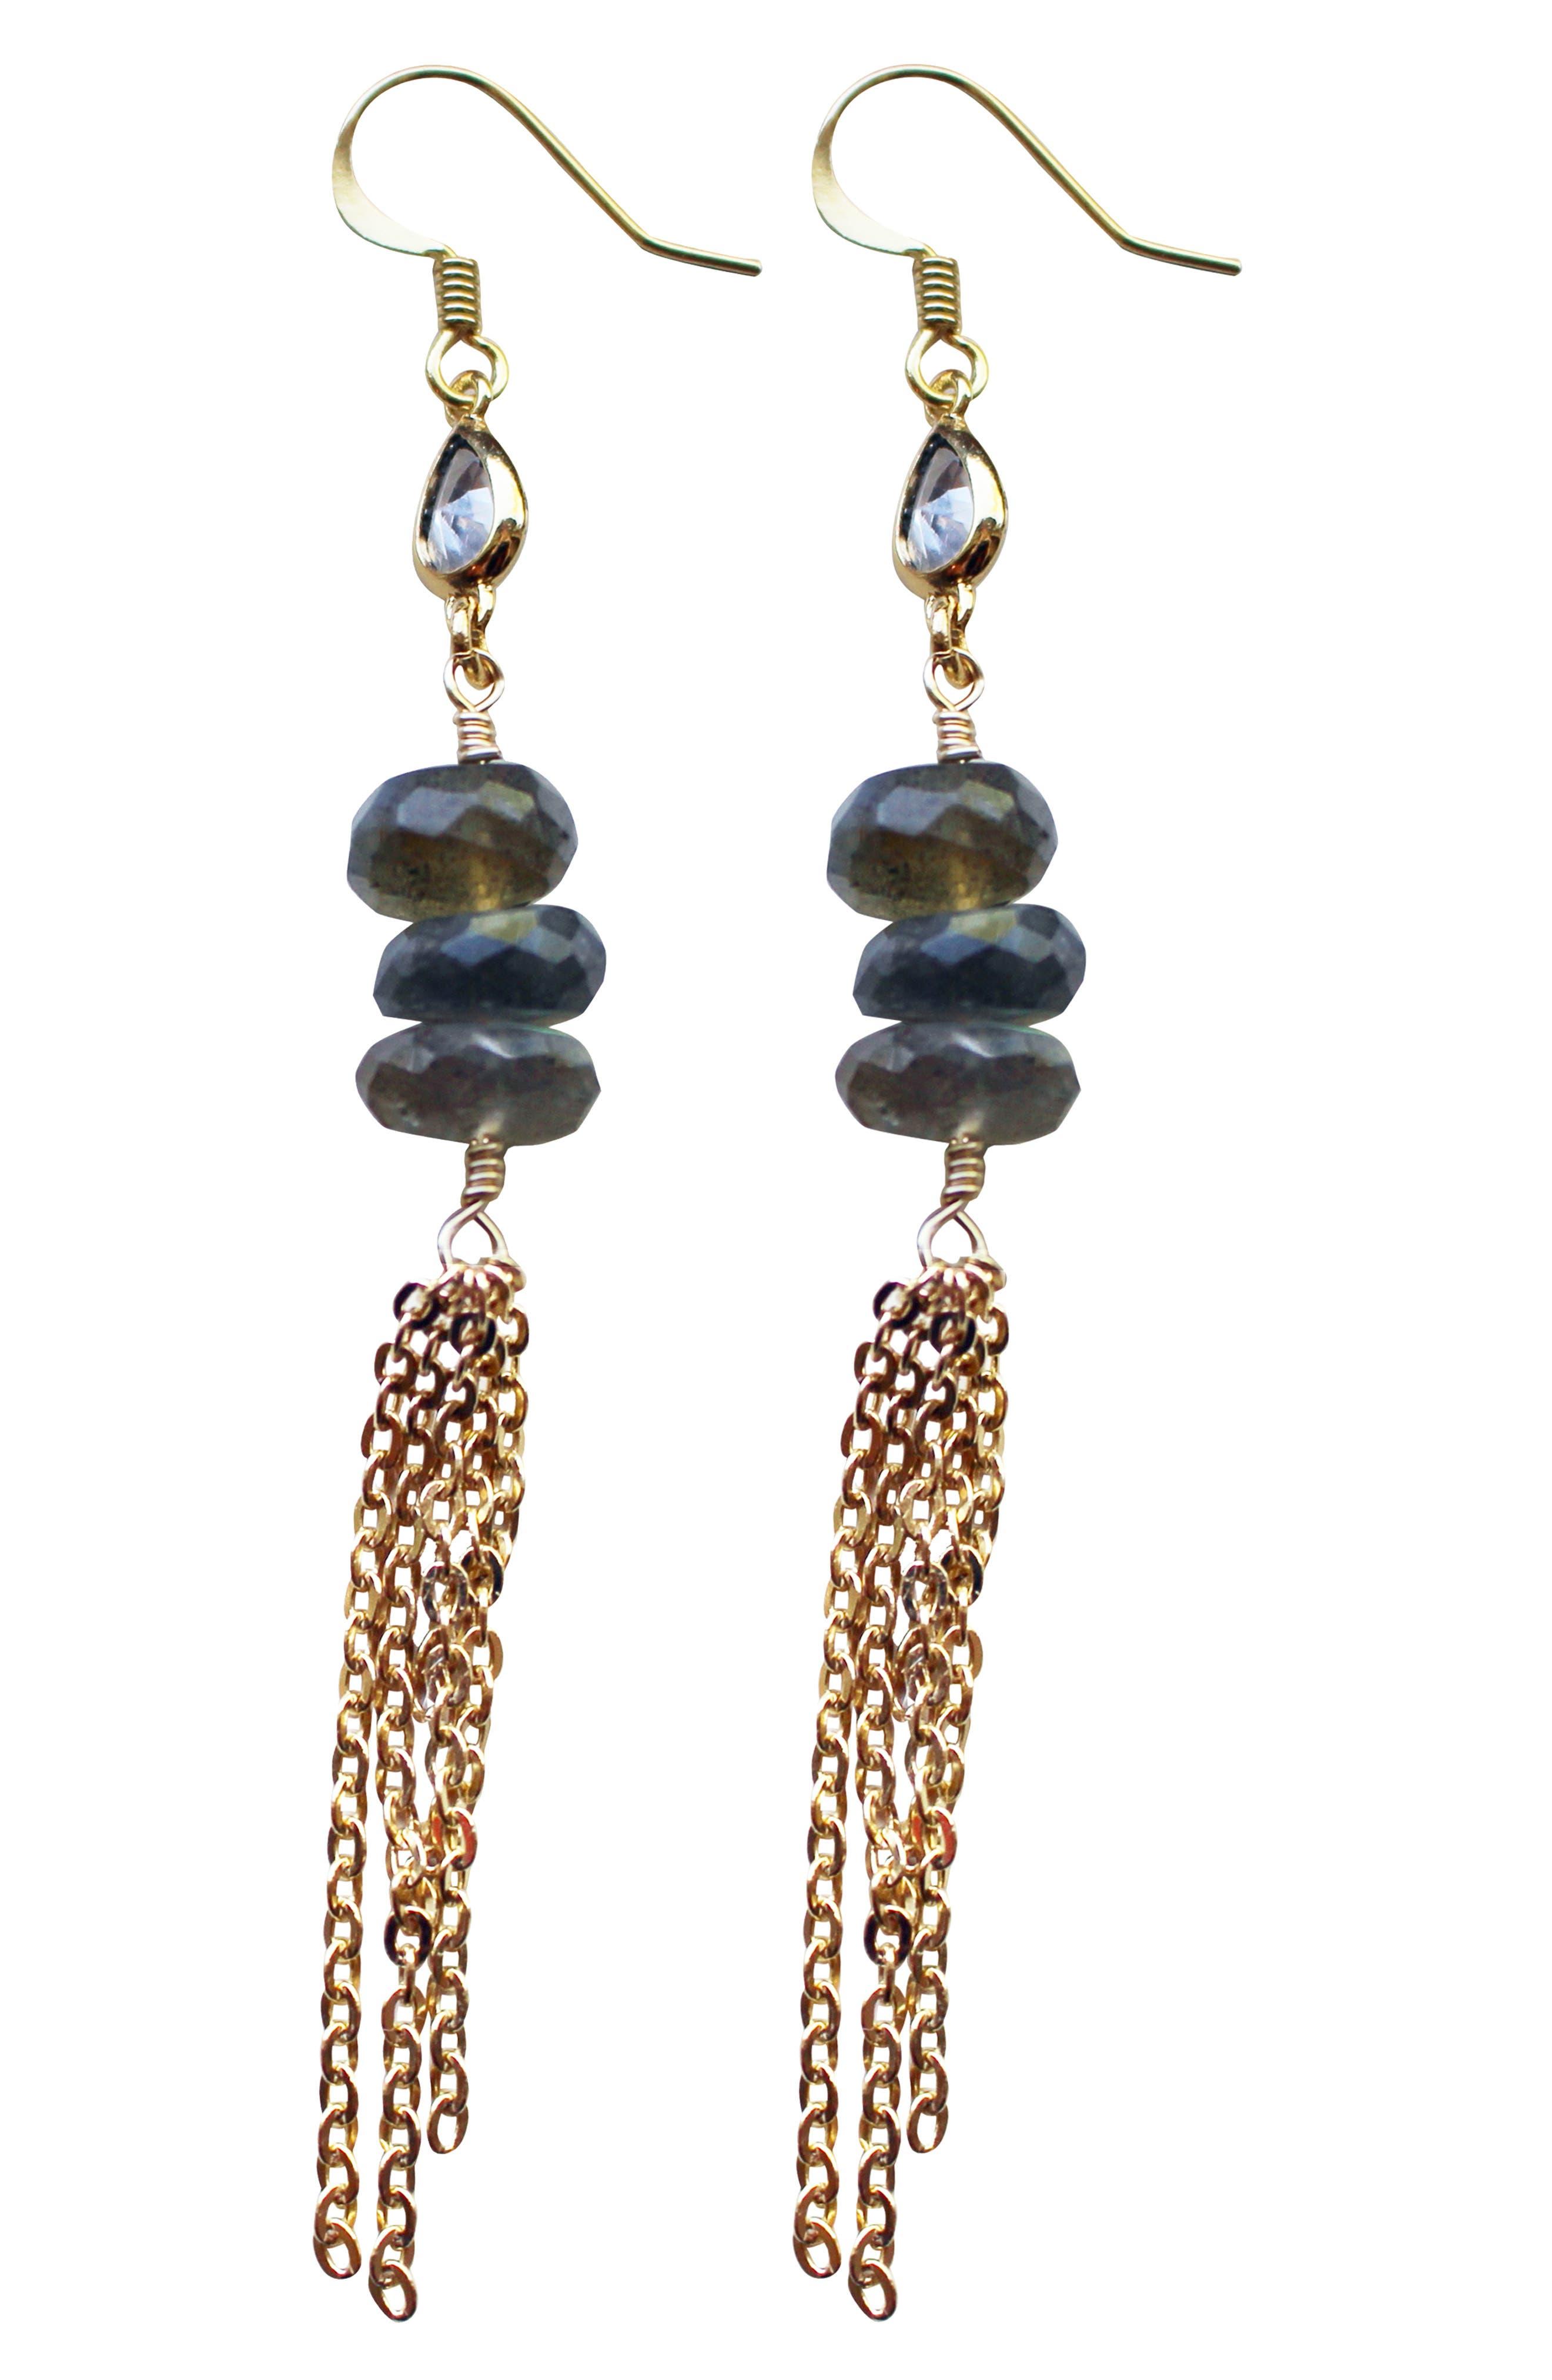 Stone & Tassel Drop Earrings,                             Main thumbnail 1, color,                             LABRADORITE